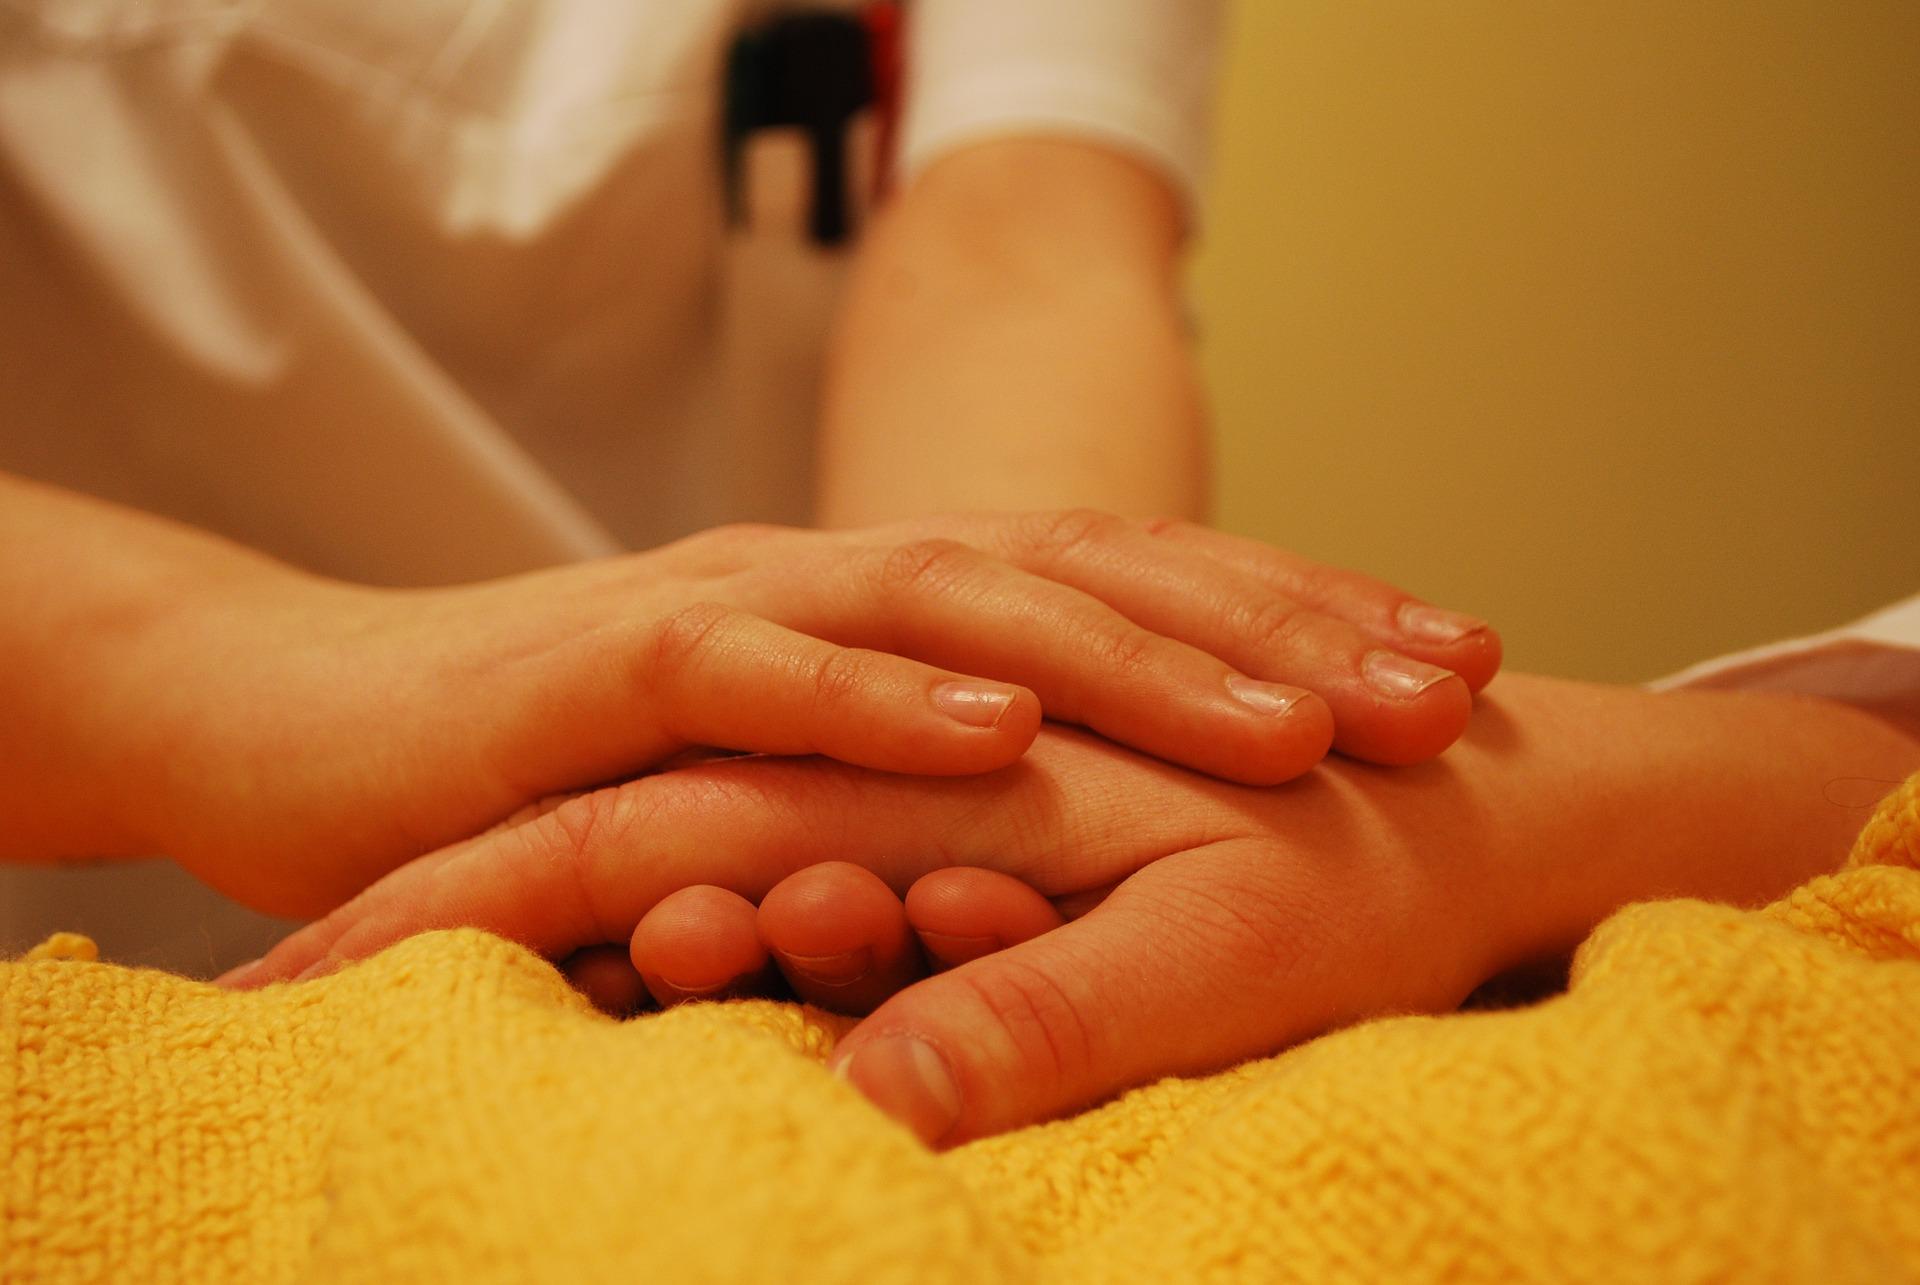 Betreuervergütung - als unzulässige Rechtsausübung